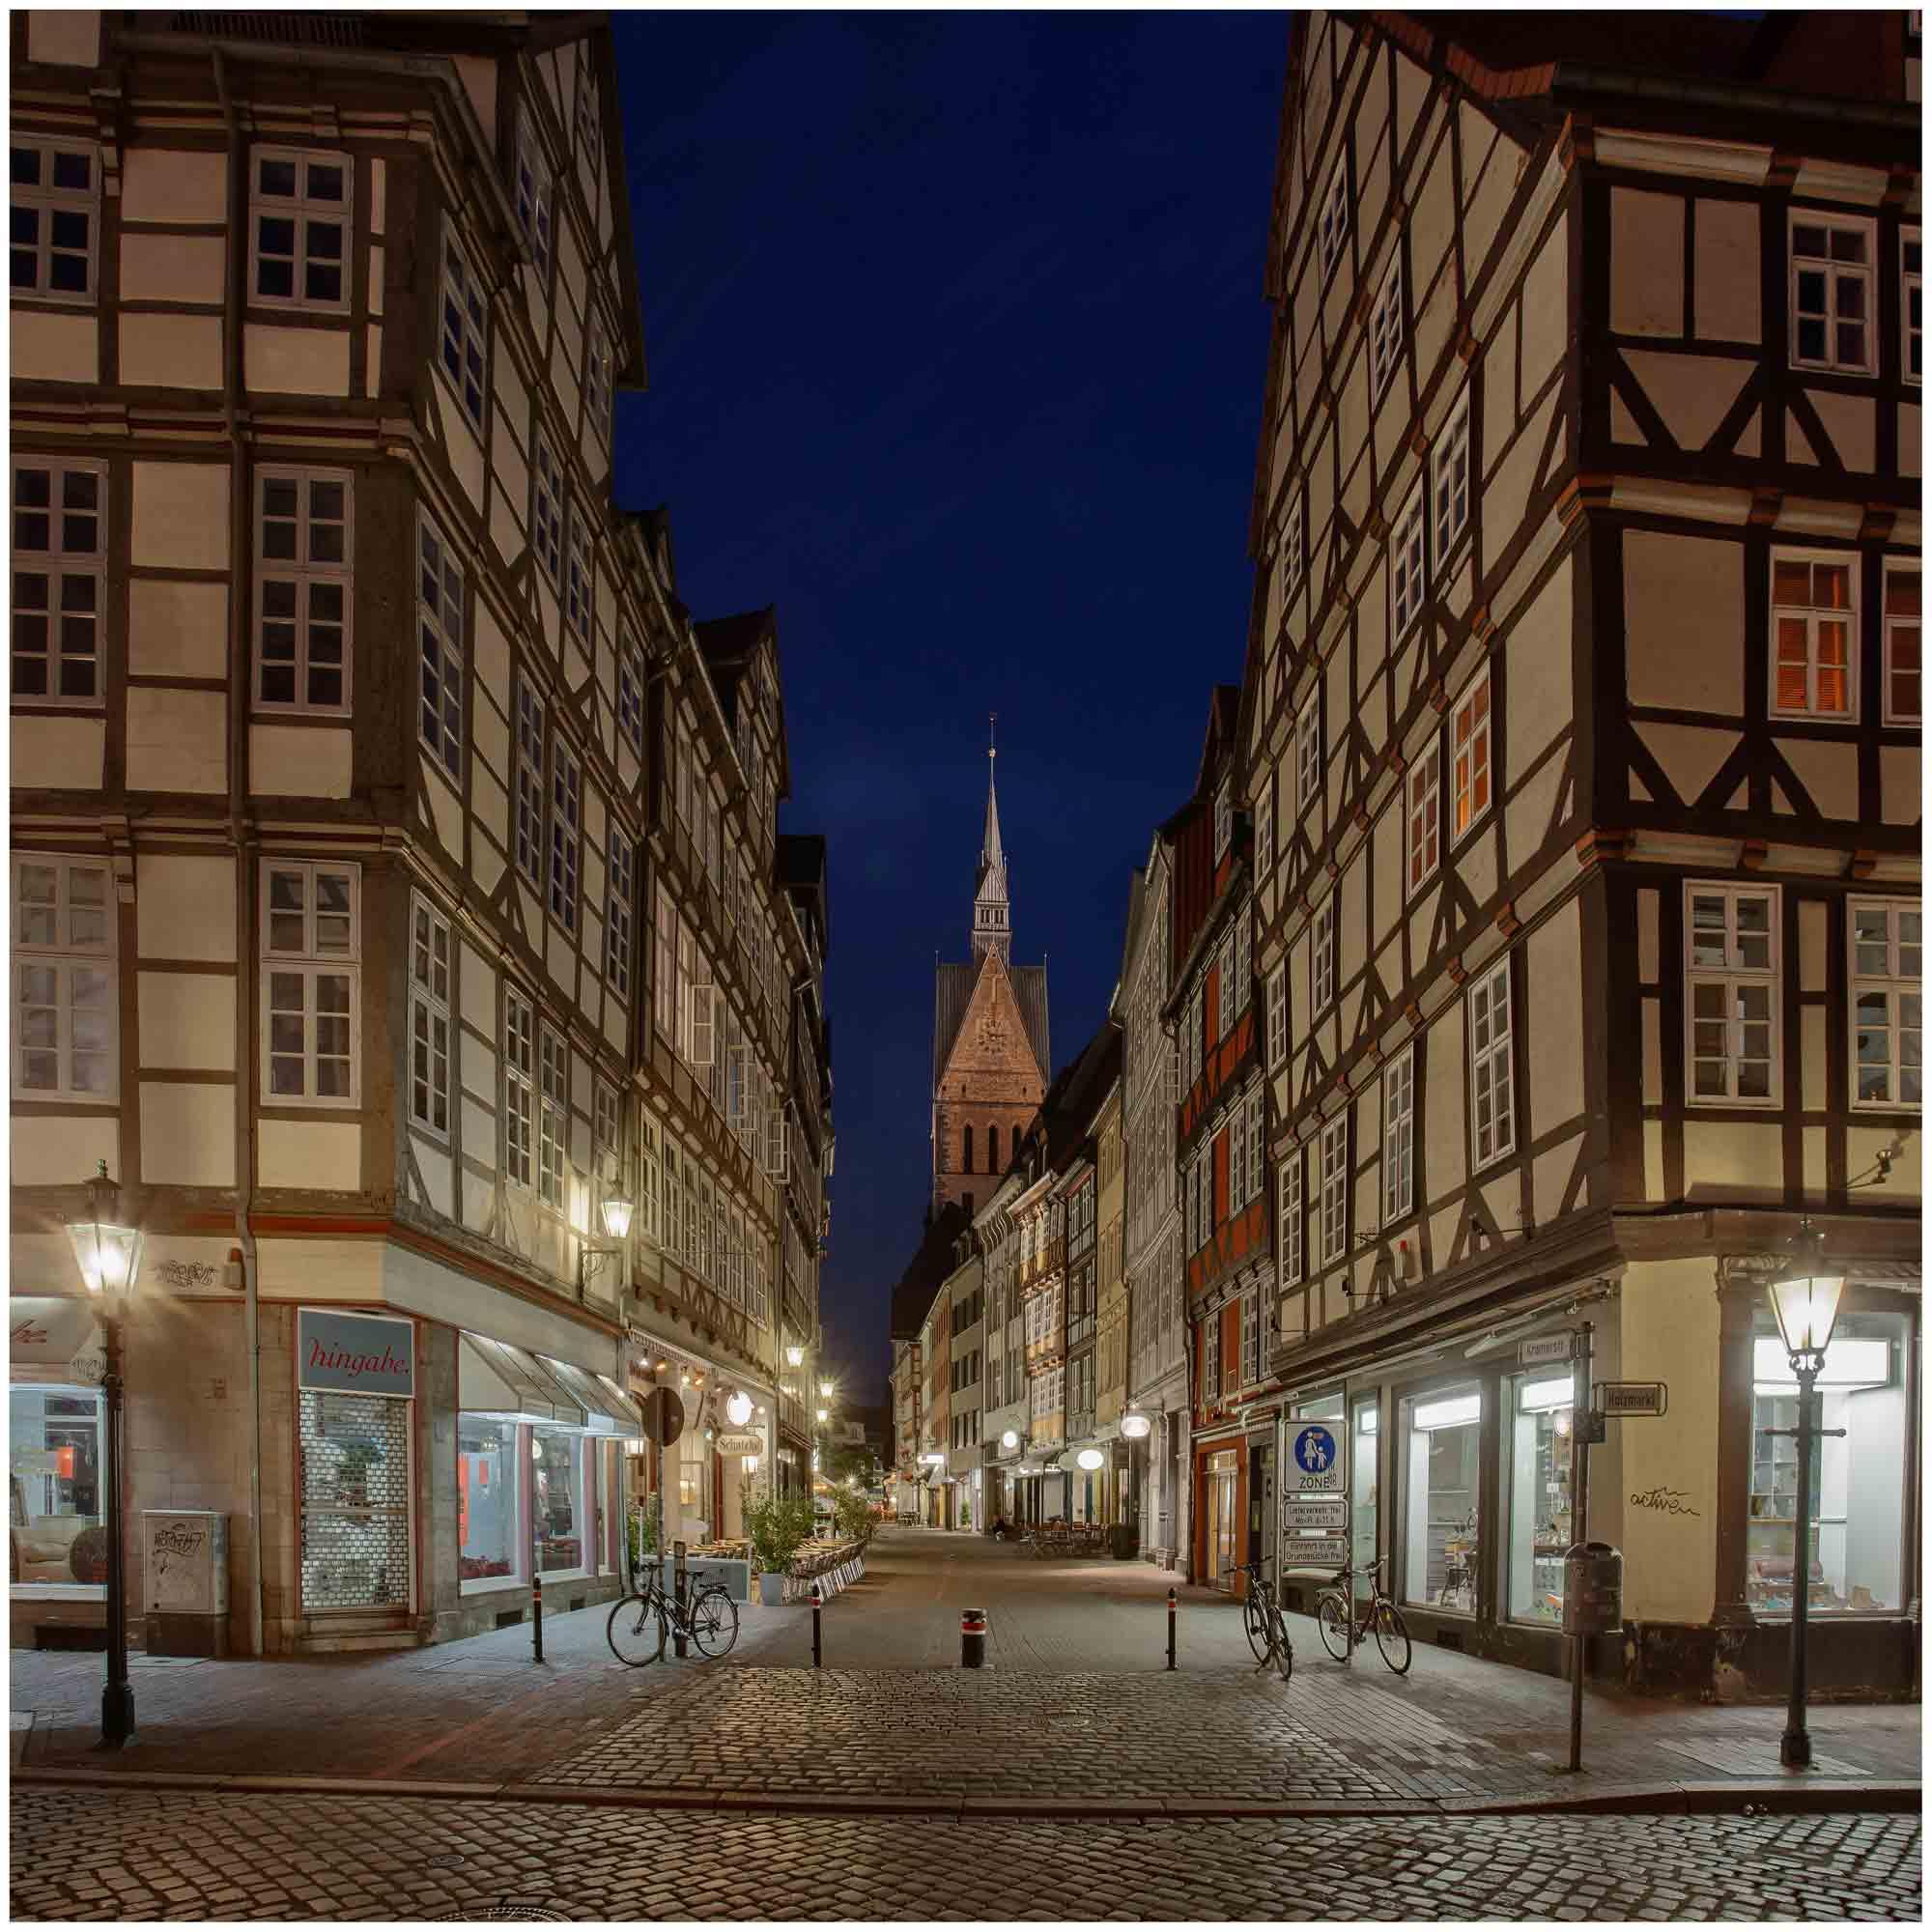 Kramerstrasse